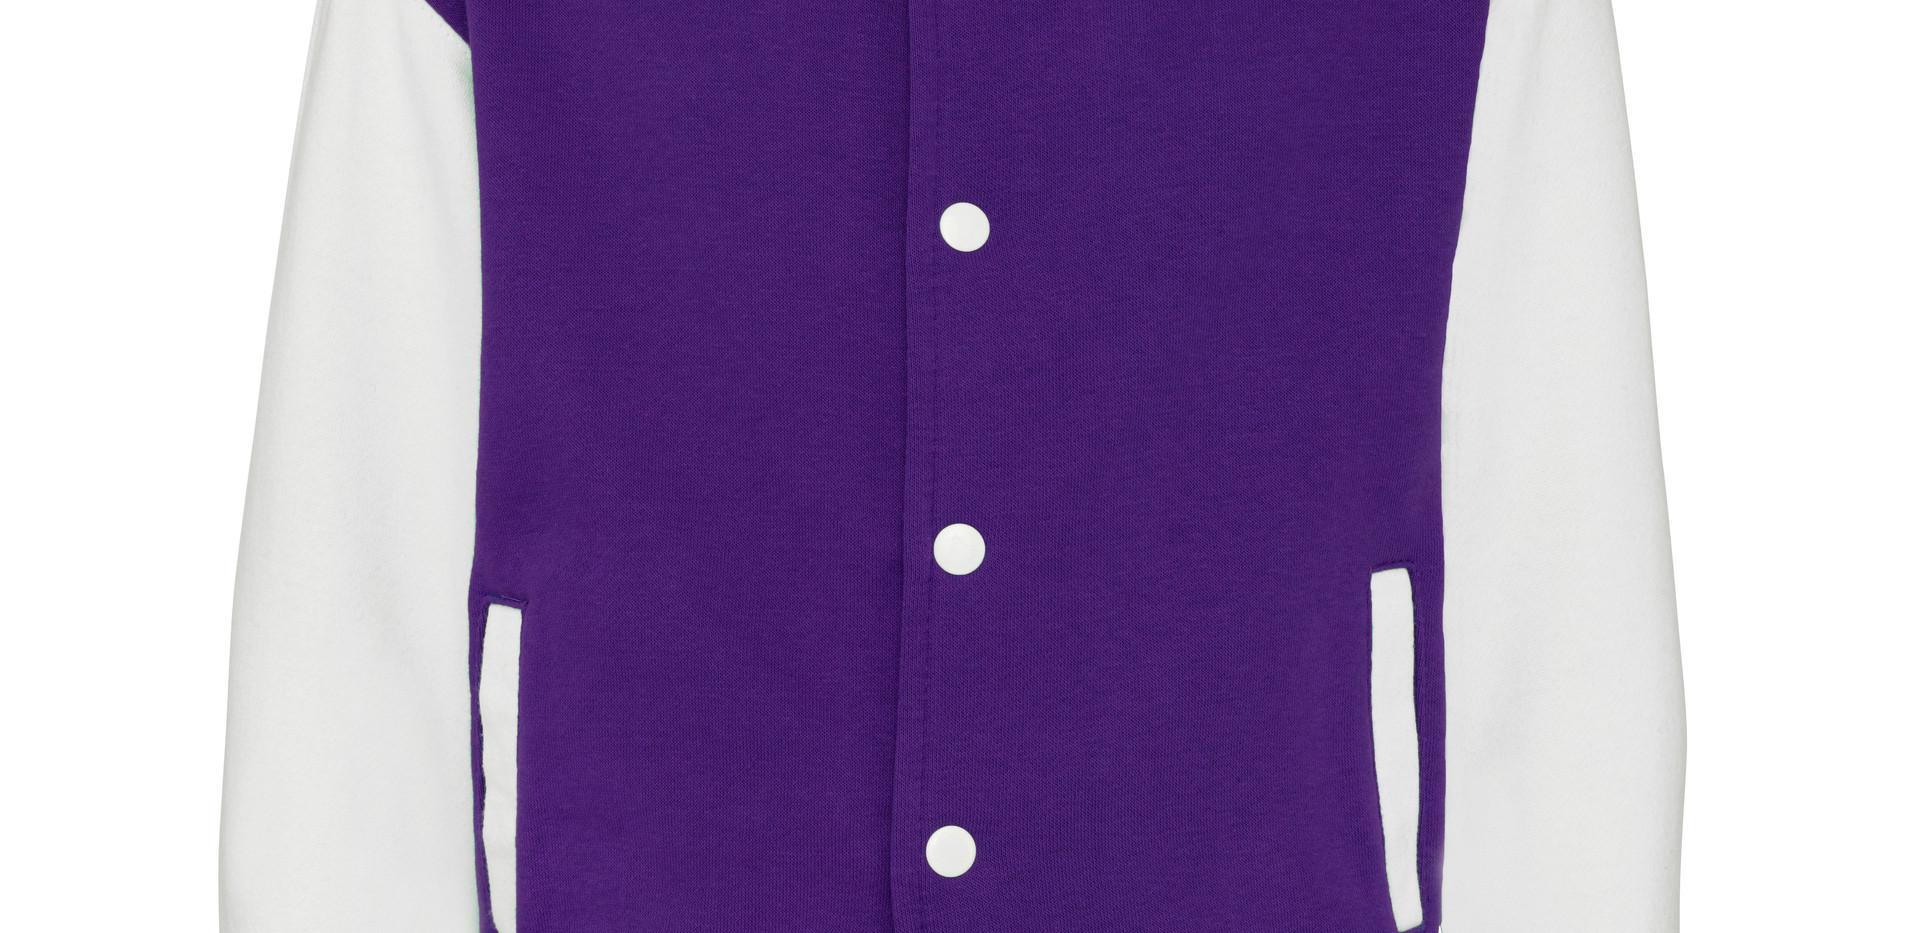 JH43J_Purple_White_FT.jpg